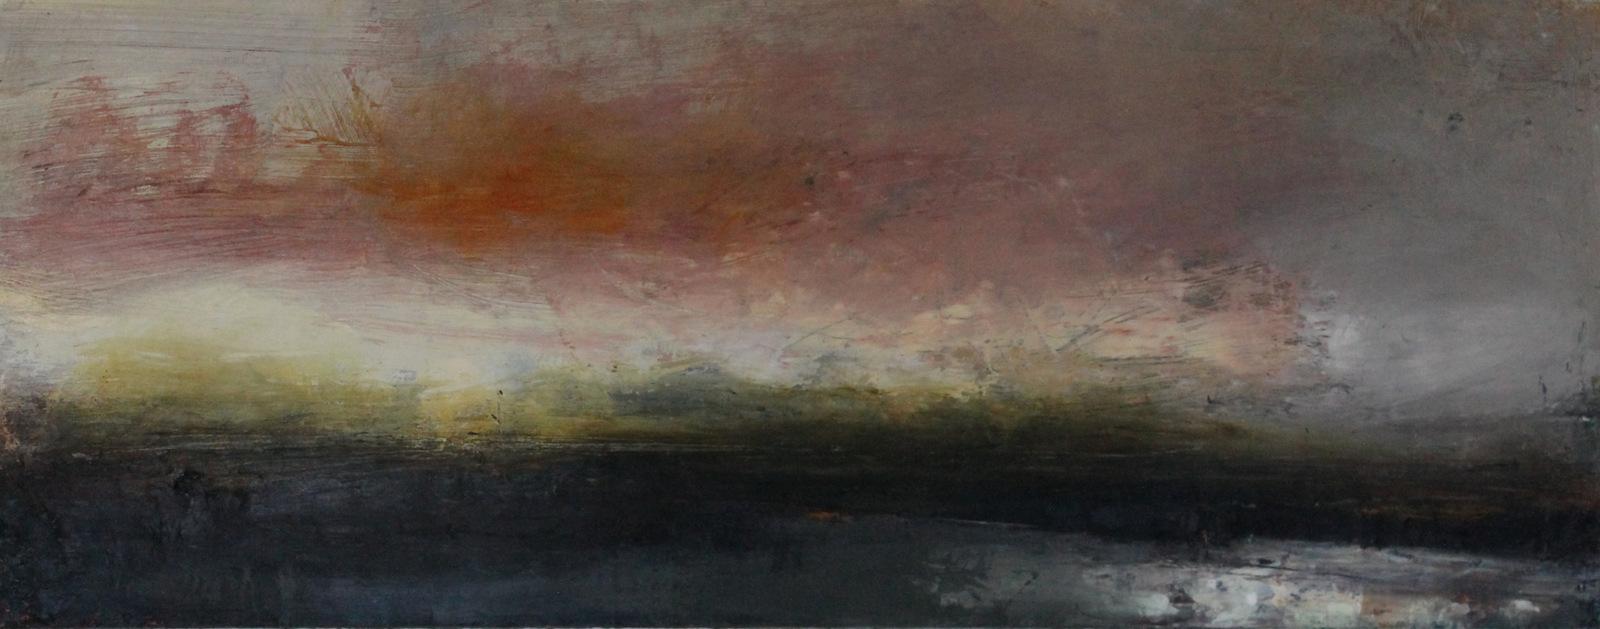 last light - Derriana | oil on canvas |